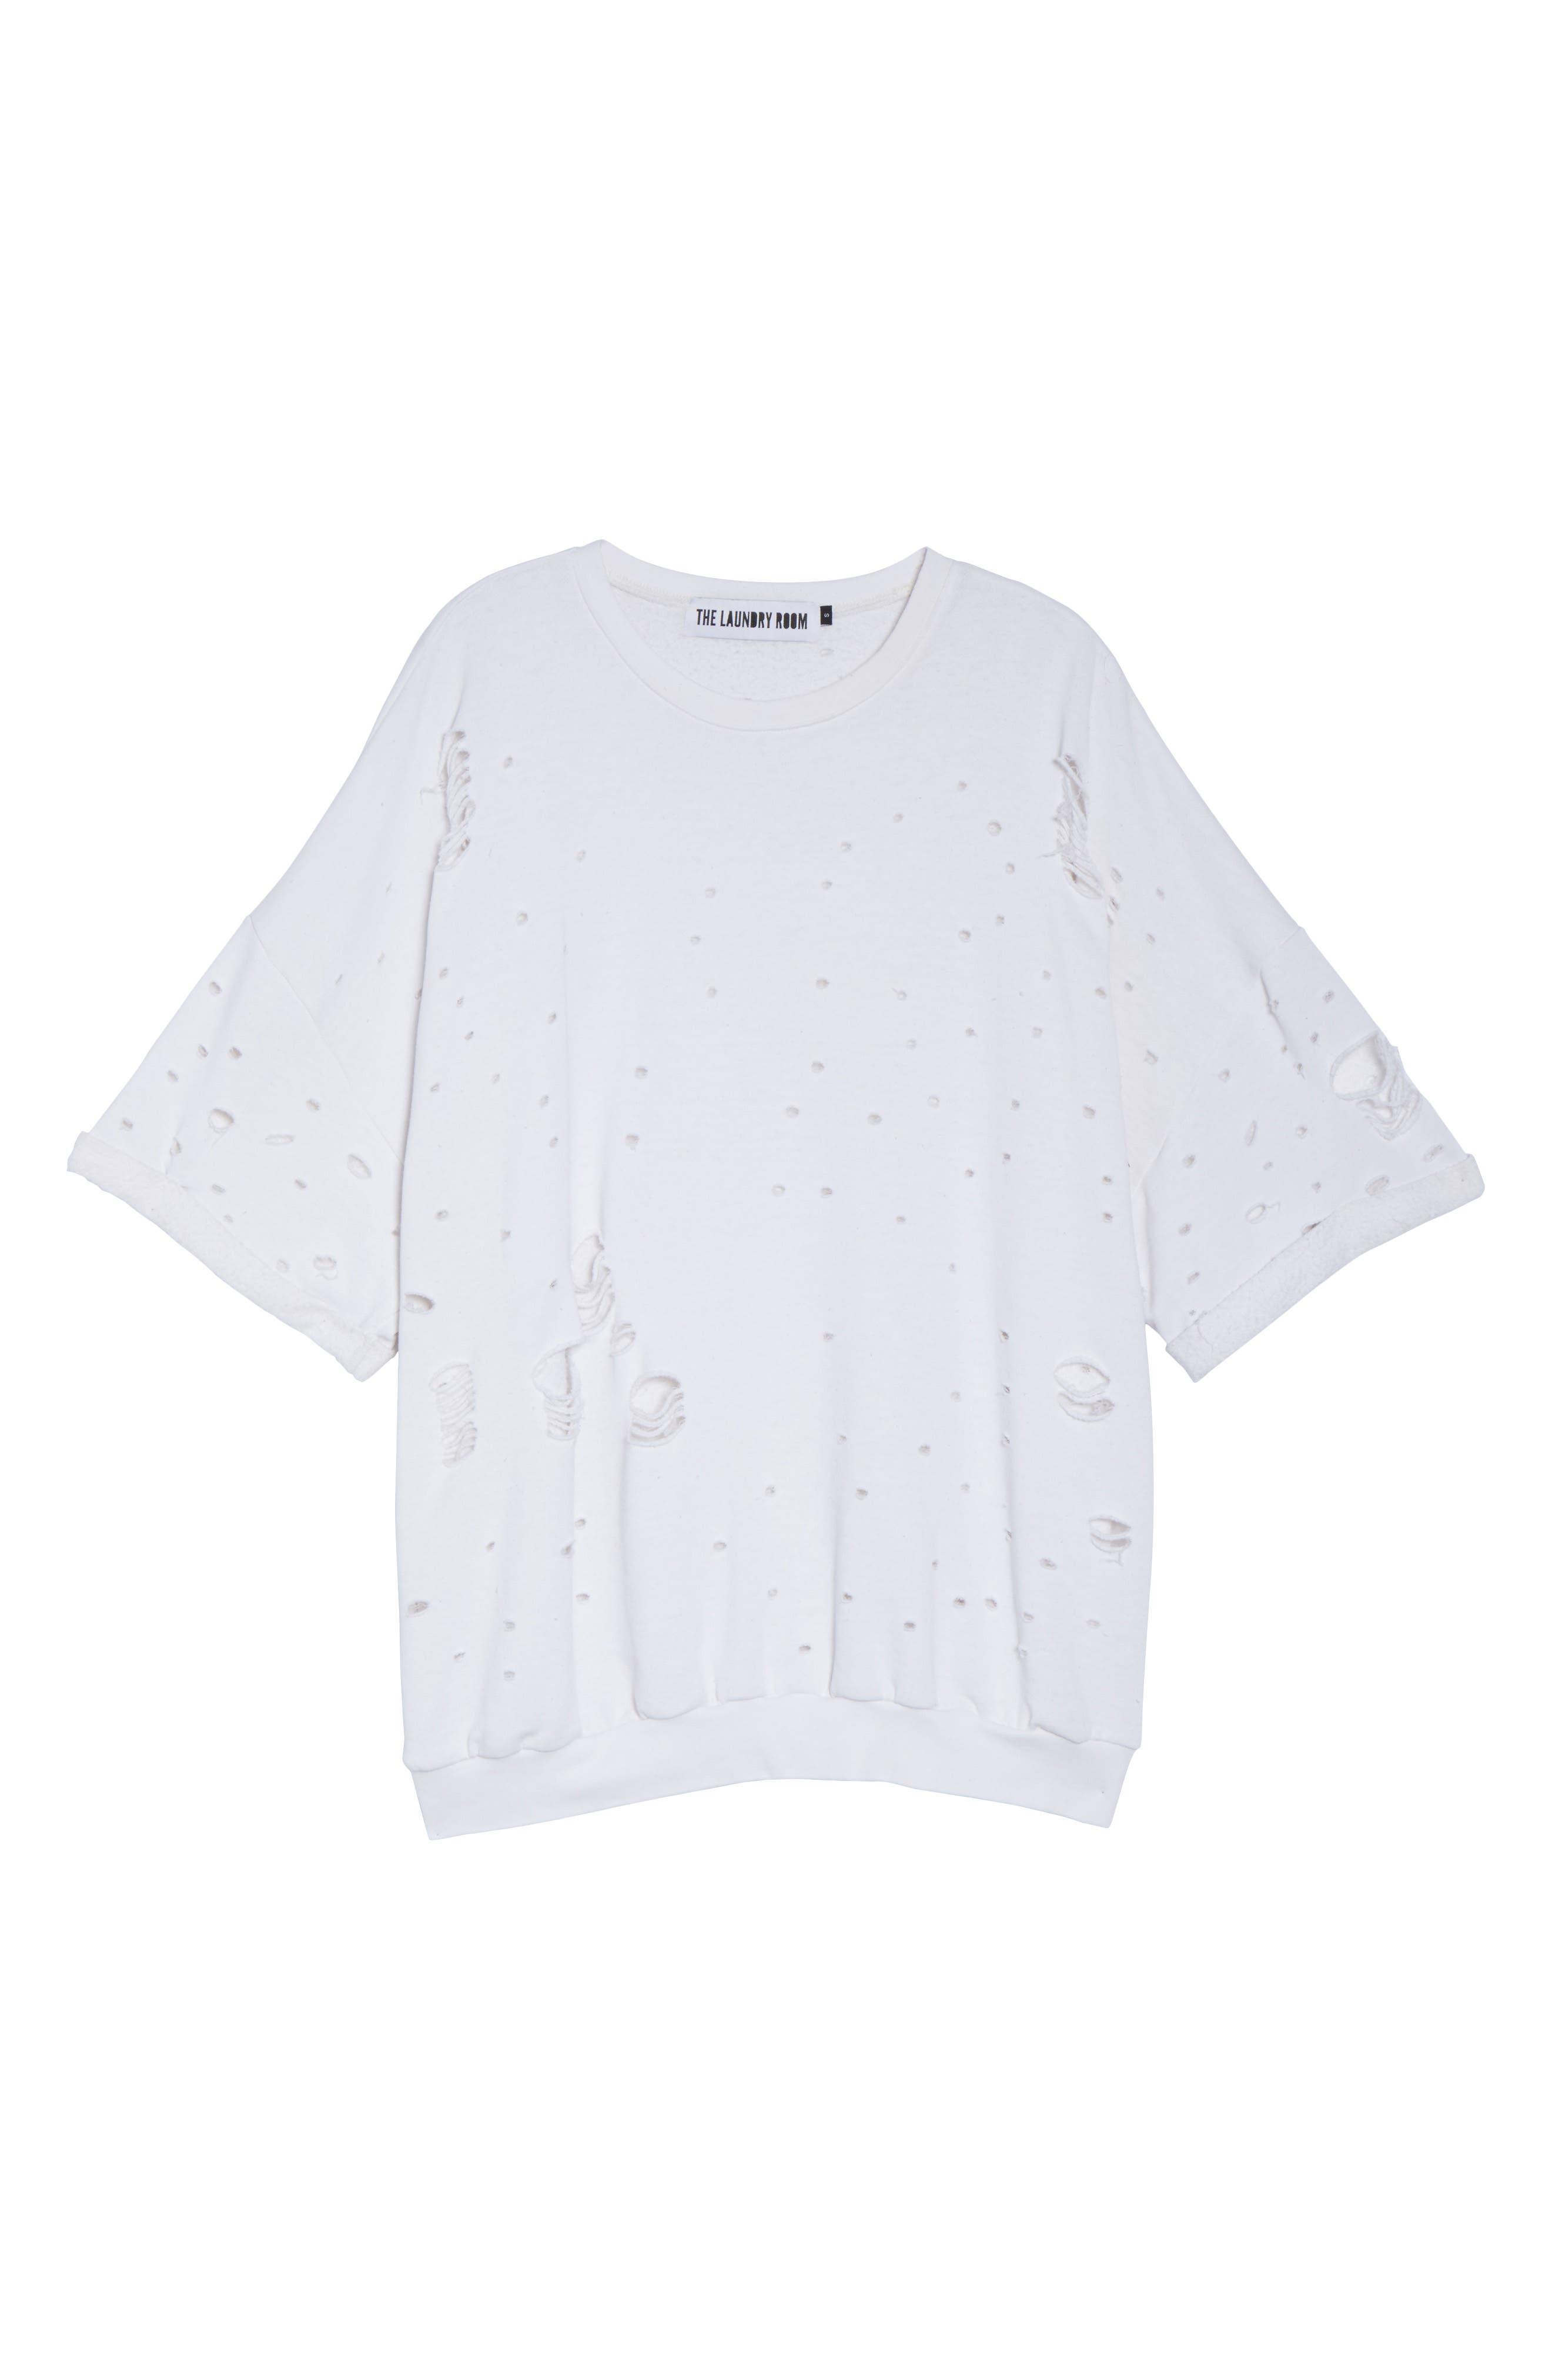 Thrasher Sweatshirt,                             Alternate thumbnail 6, color,